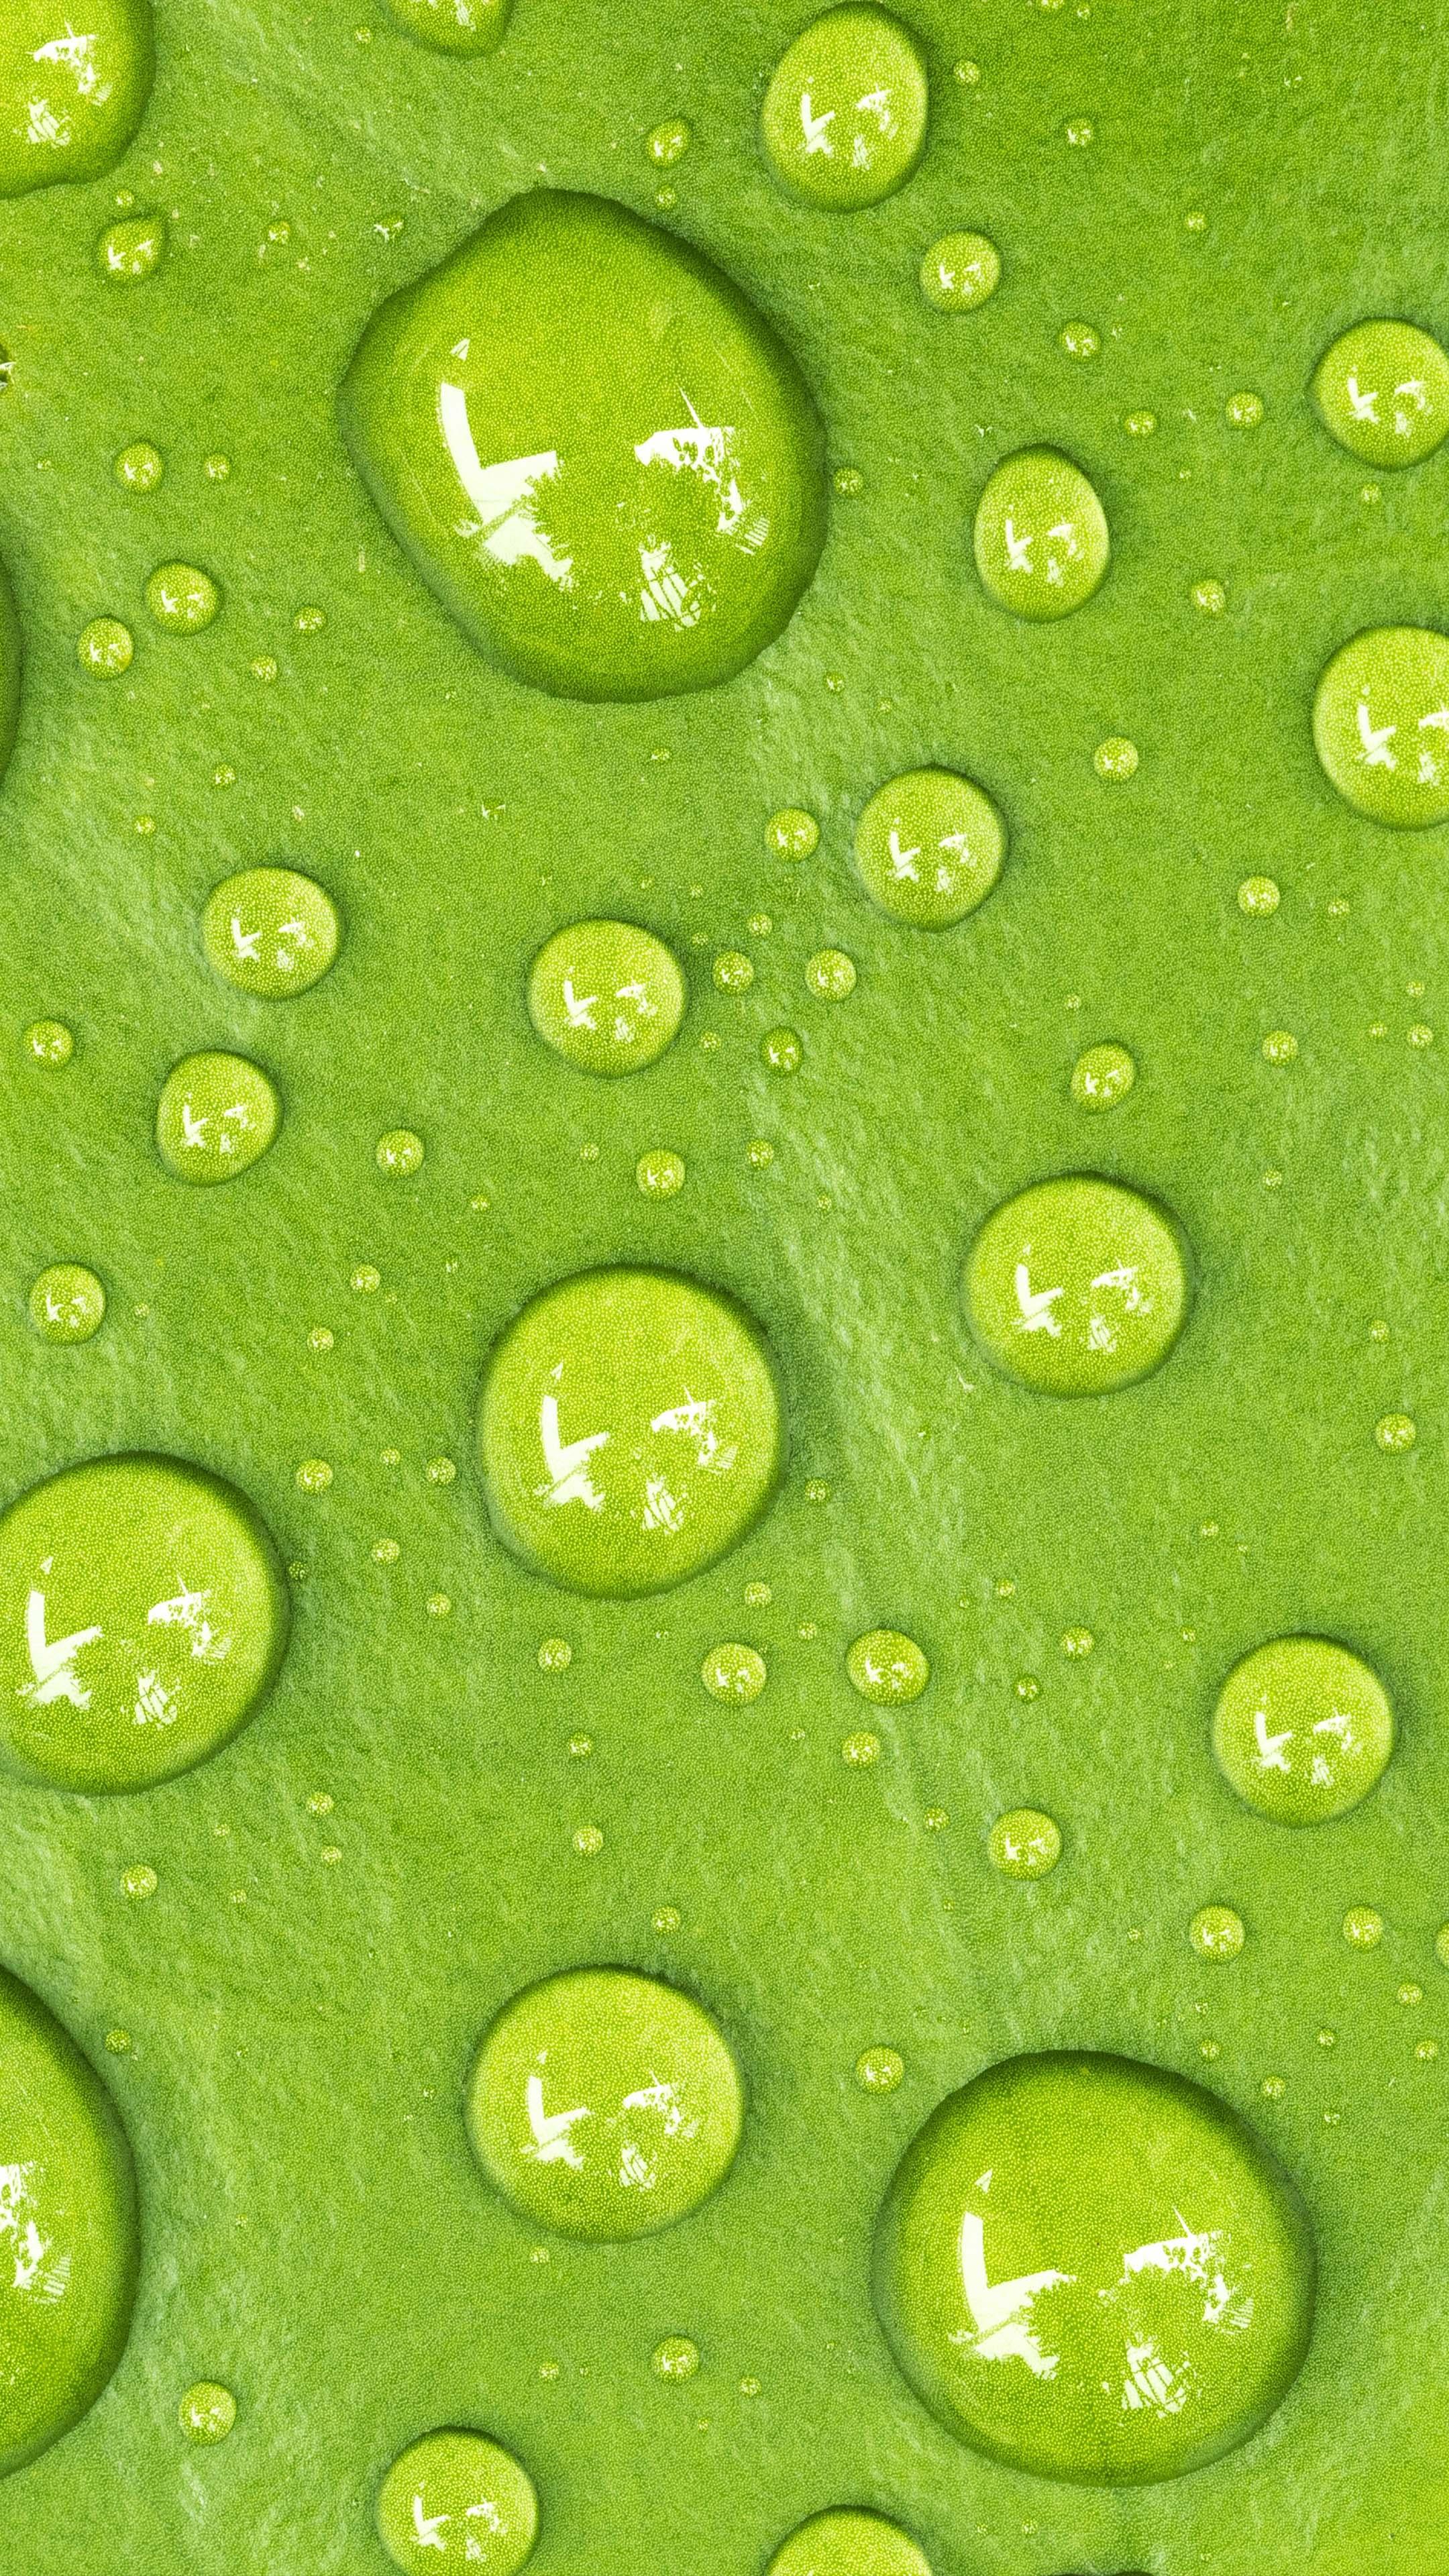 Water Drop Green Macro 4k Ultra Hd Mobile Wallpaper